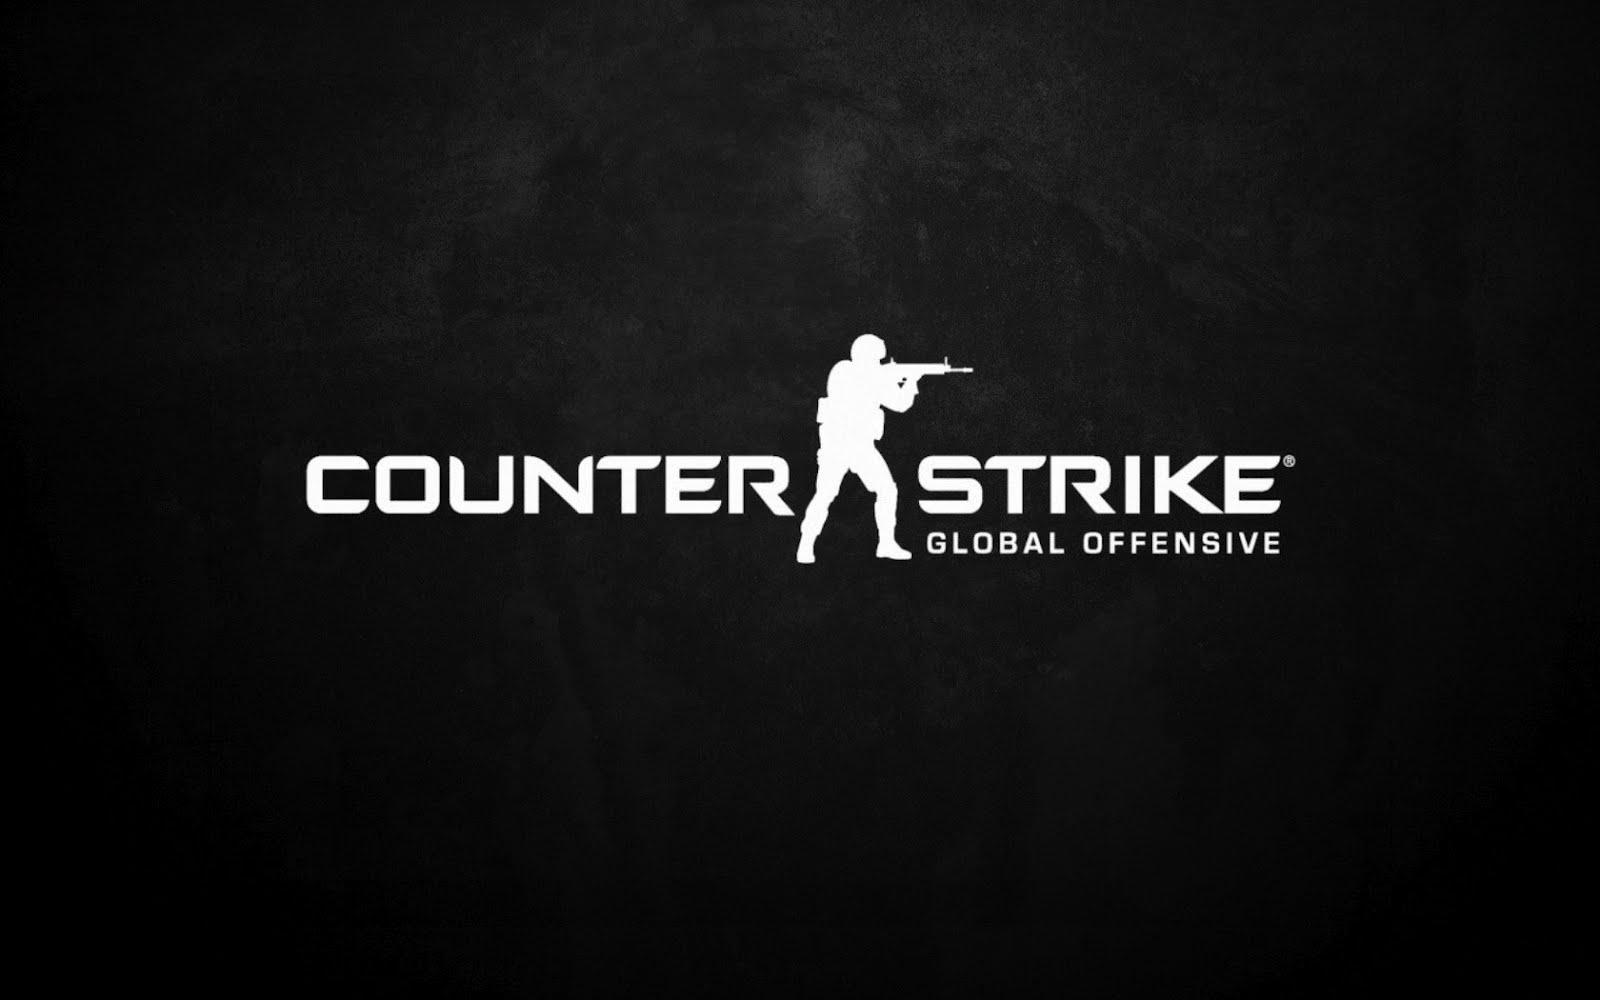 Counter-Strike Global Offensive, HD Wallpaper